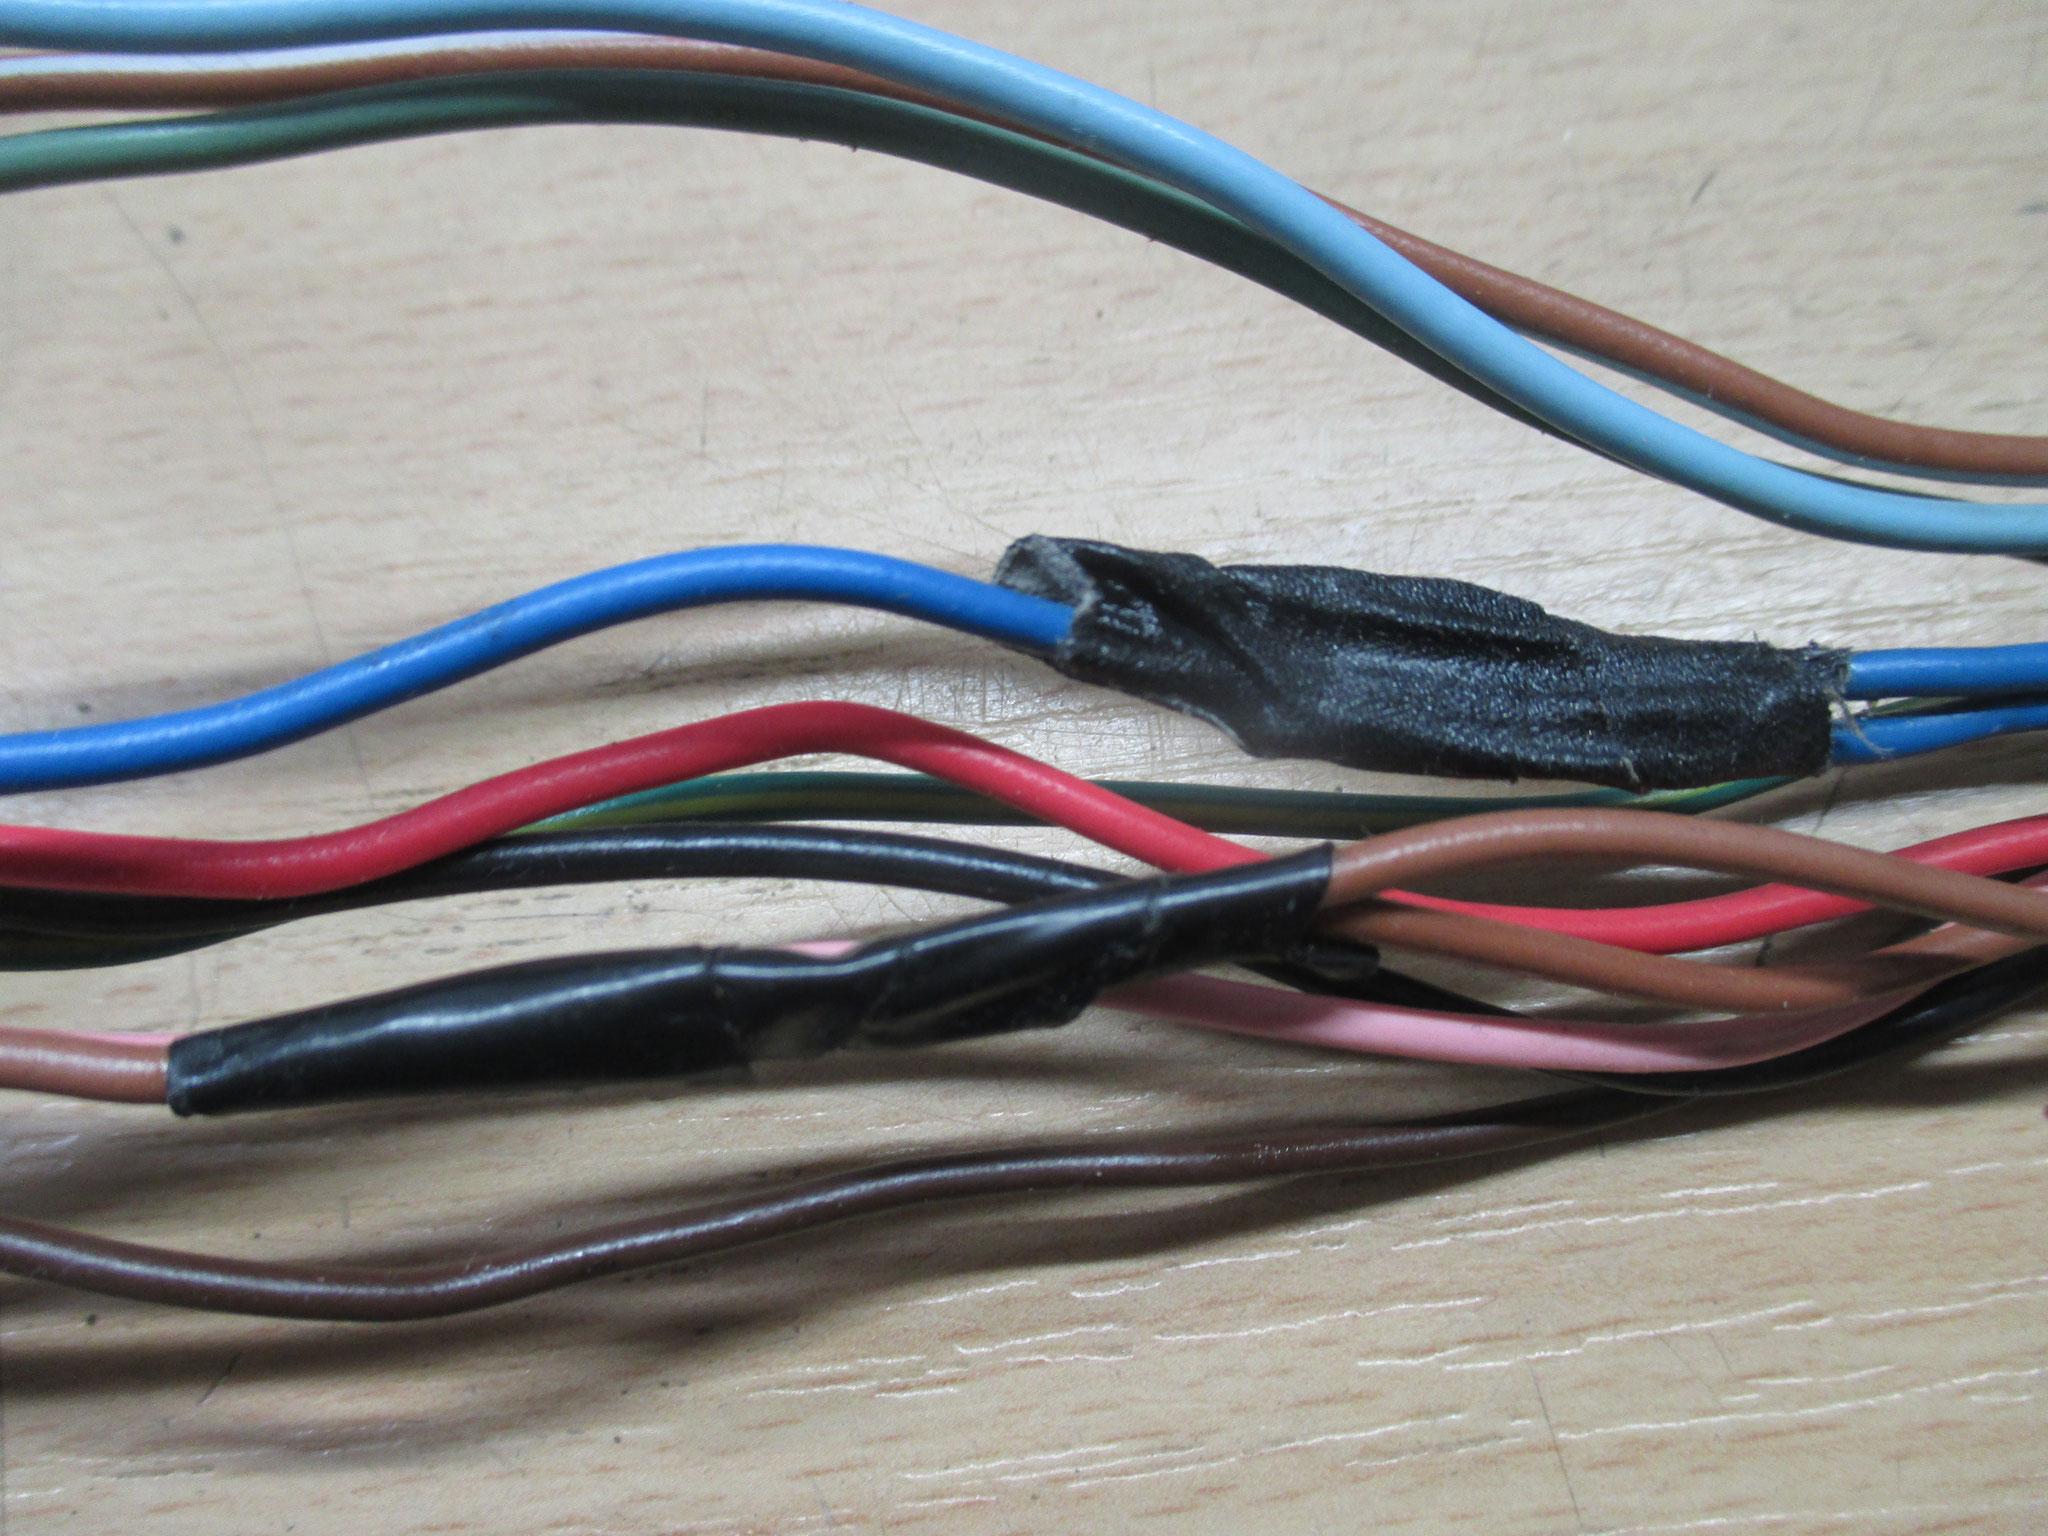 Originales Kabelsplitting - Made in Japan.